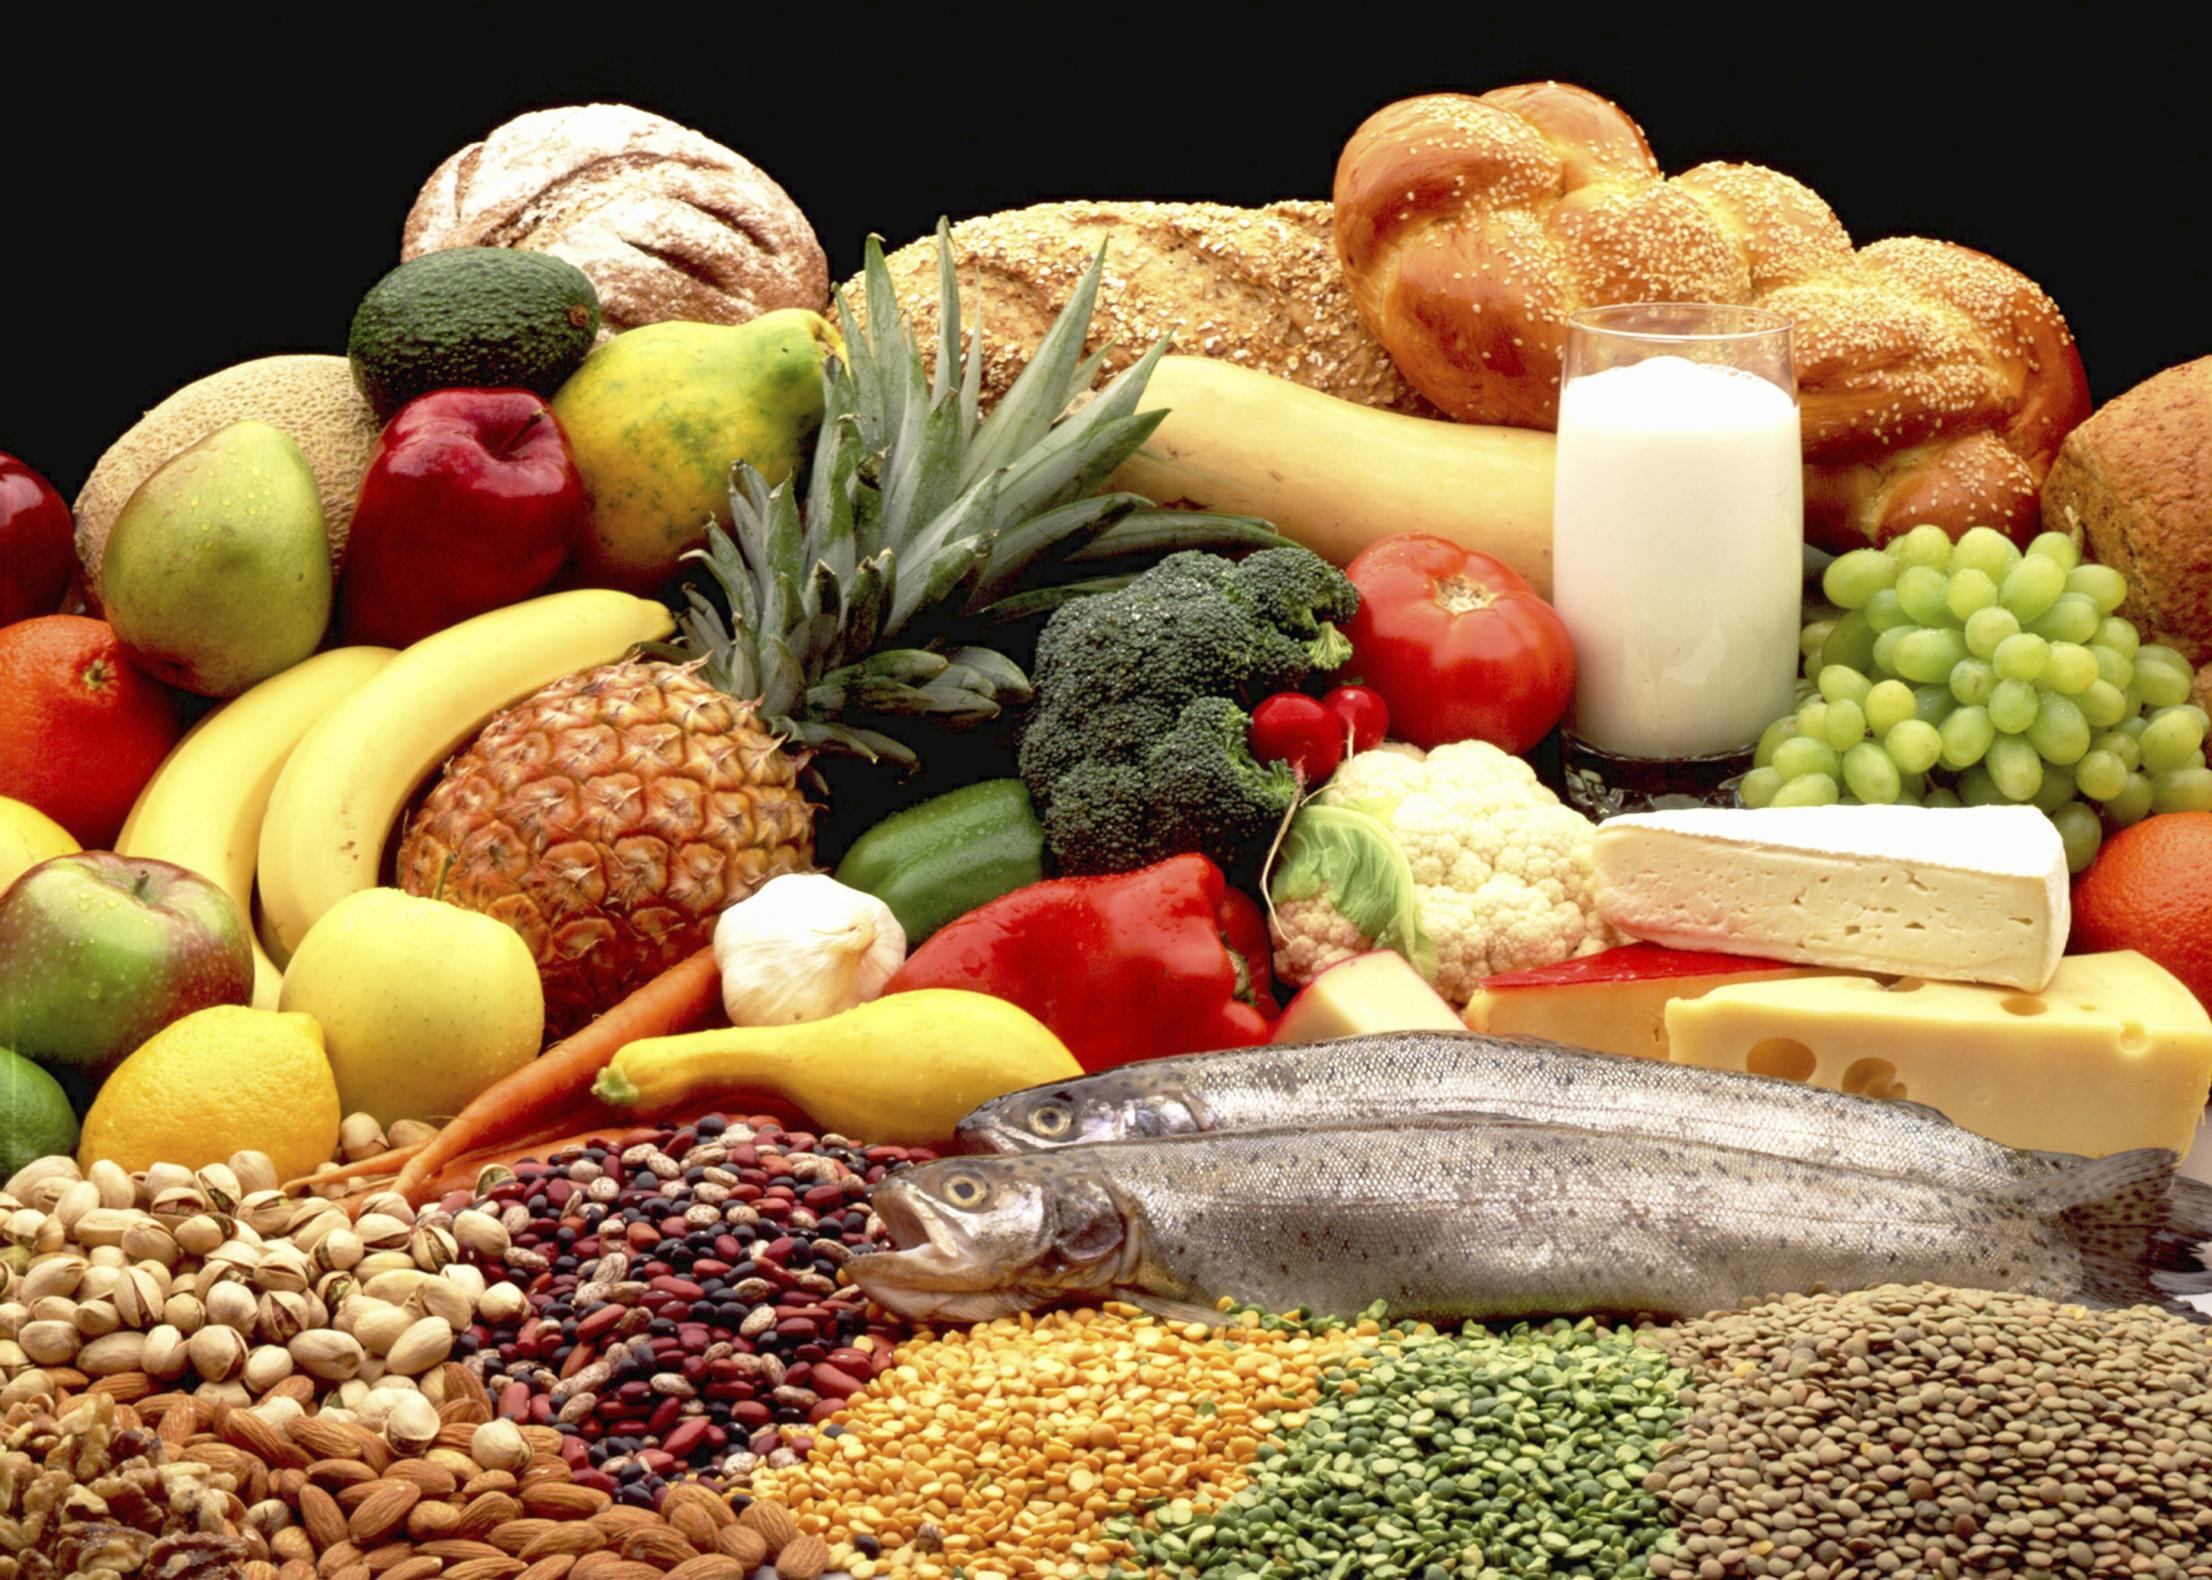 Entenda a diferença entre alergia alimentar e intolerância